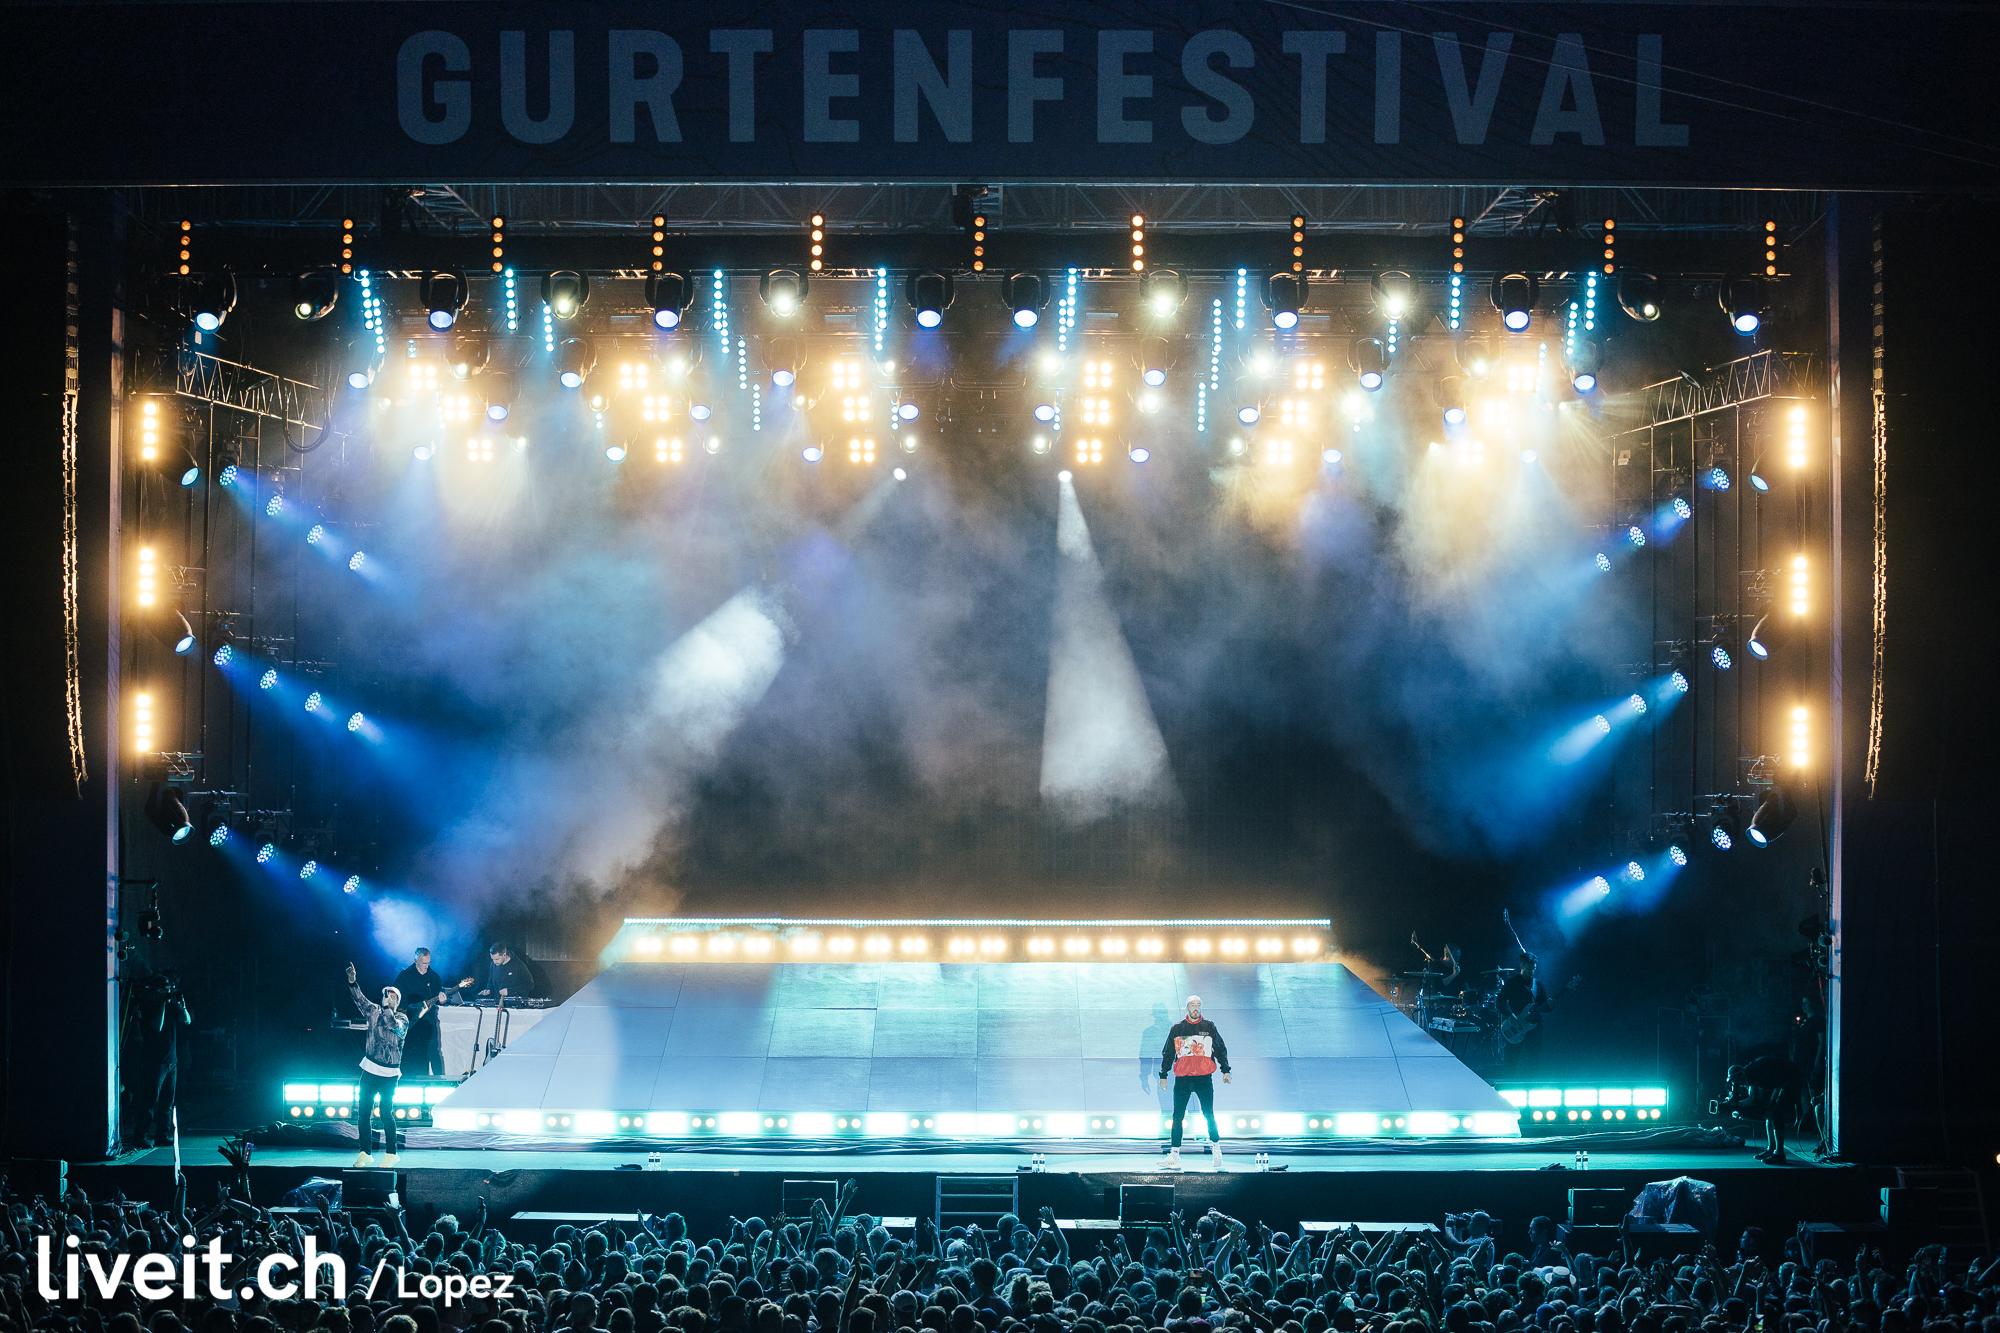 Marteria & Casper am Gurtenfestival 2019